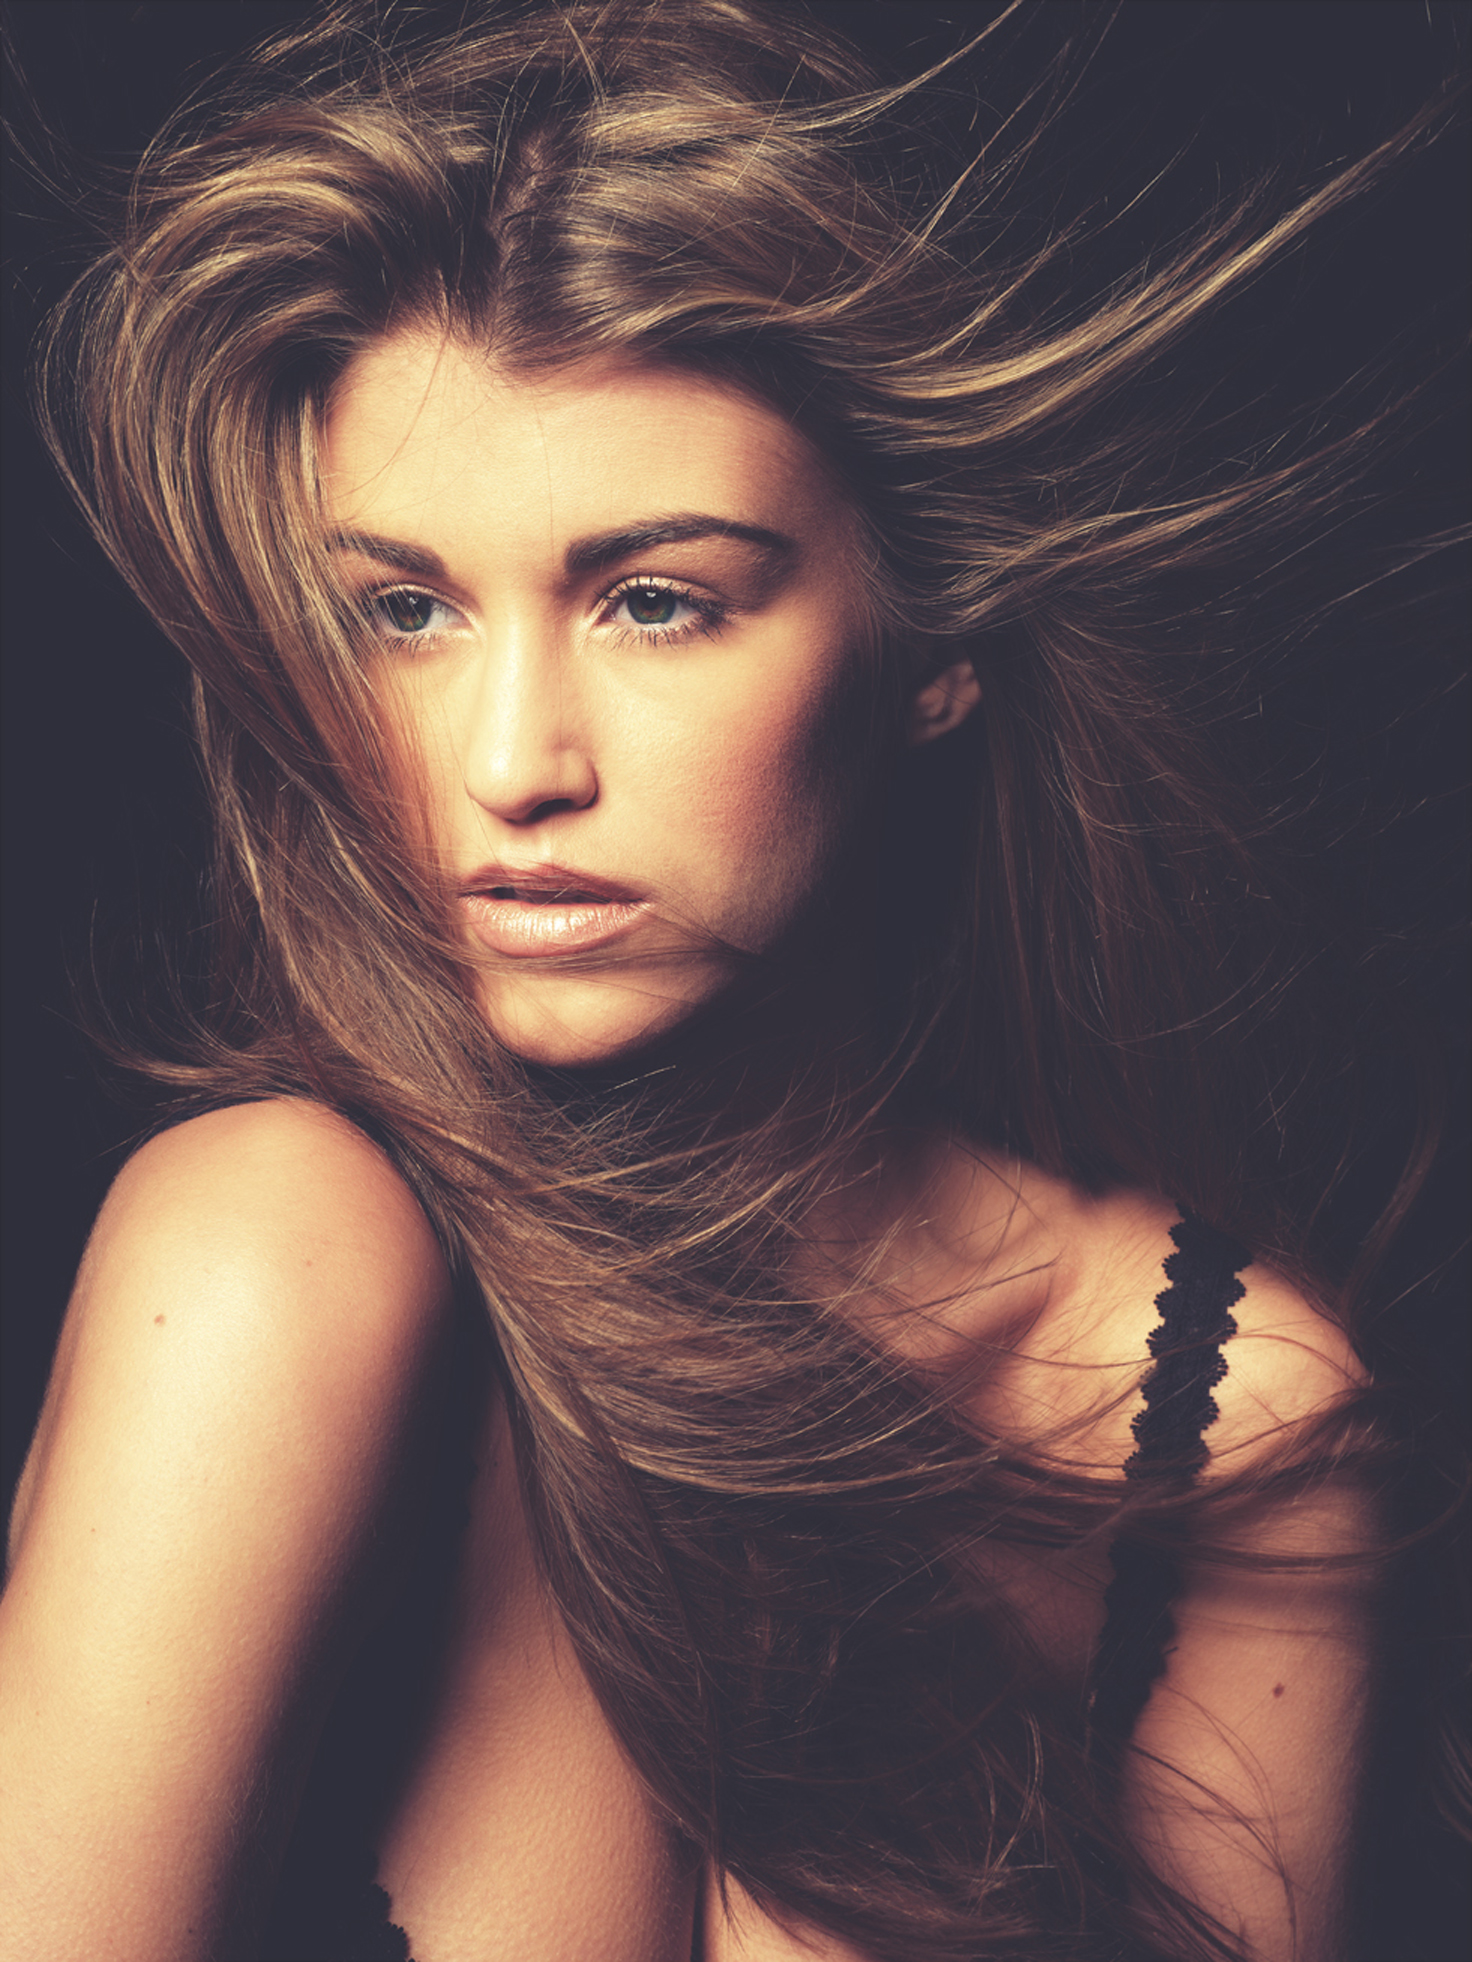 Amy willerton 3web.jpg